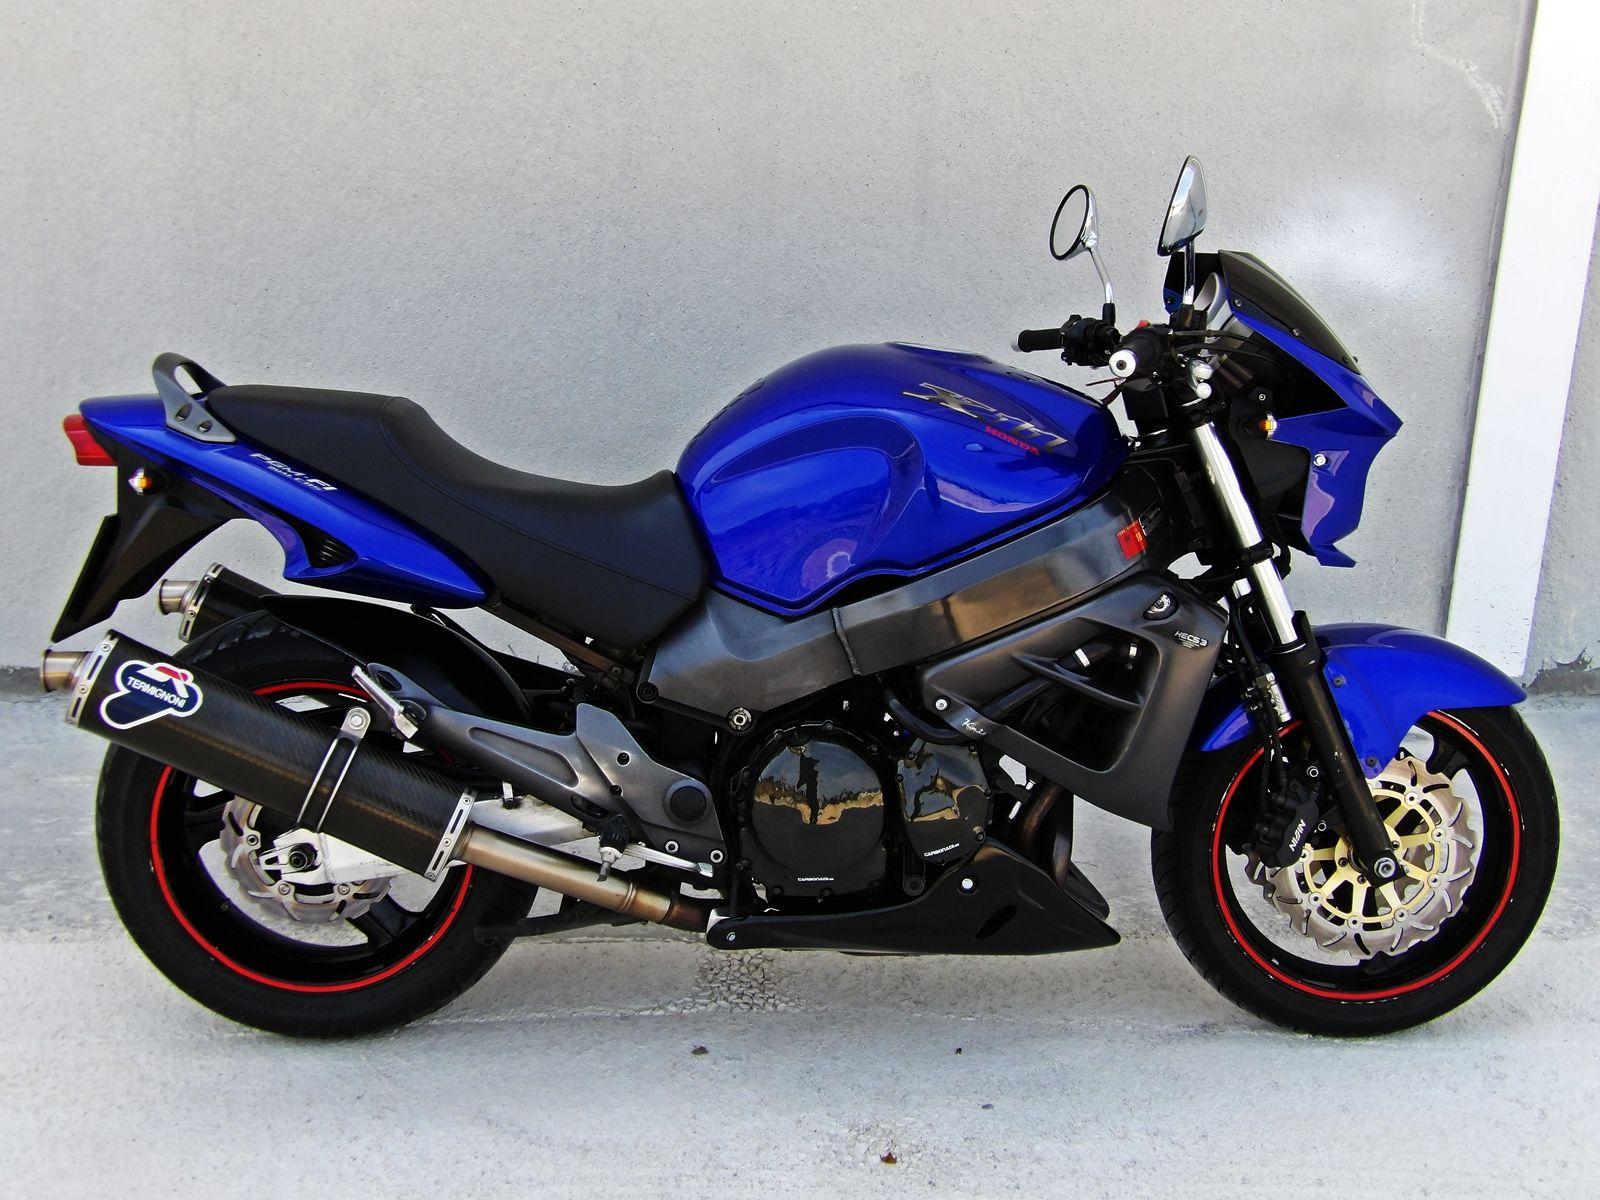 Honda x11,Honda x eleven,Naked Bike - Bestes Angebot von